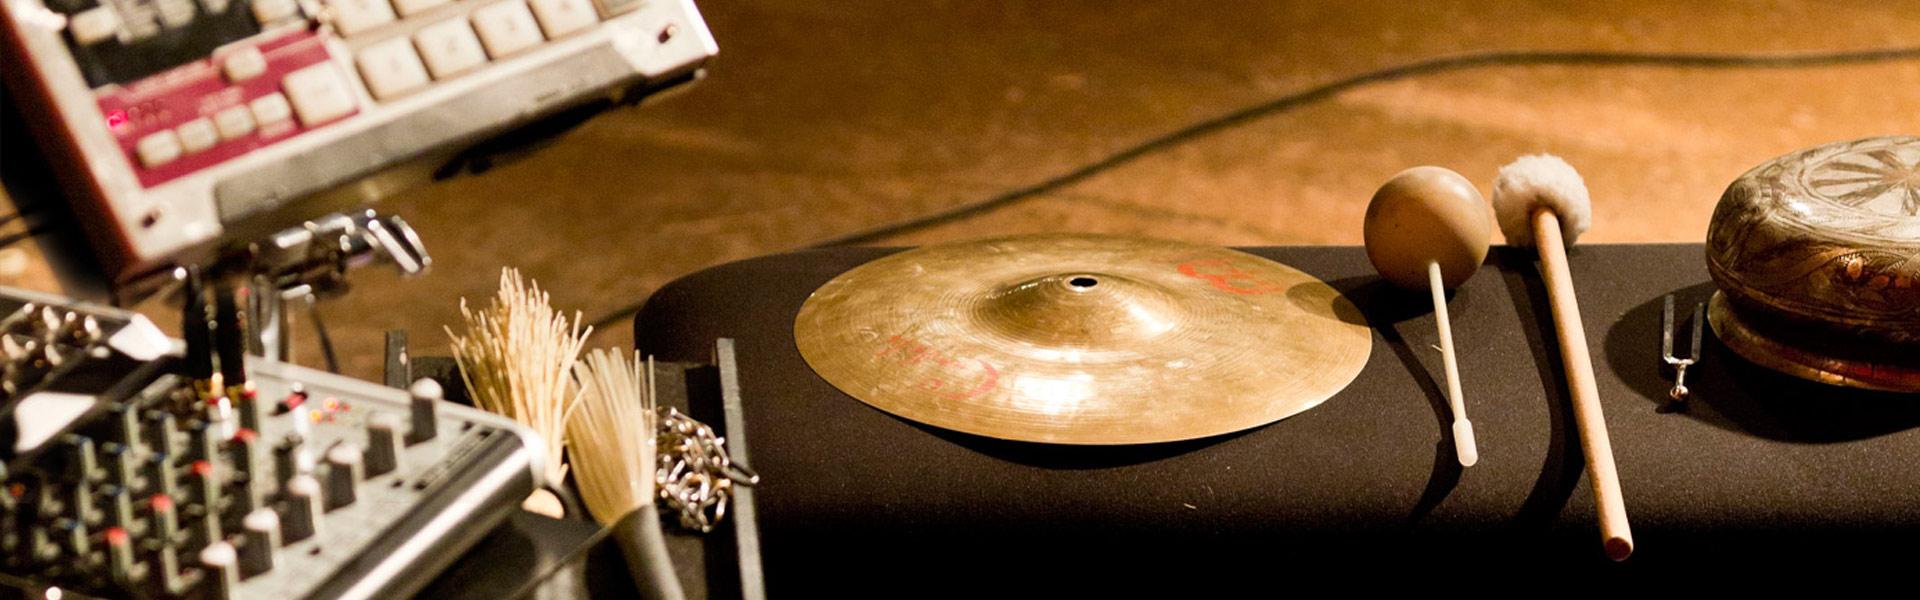 Plattform für Transkulturelle Neue Musik -